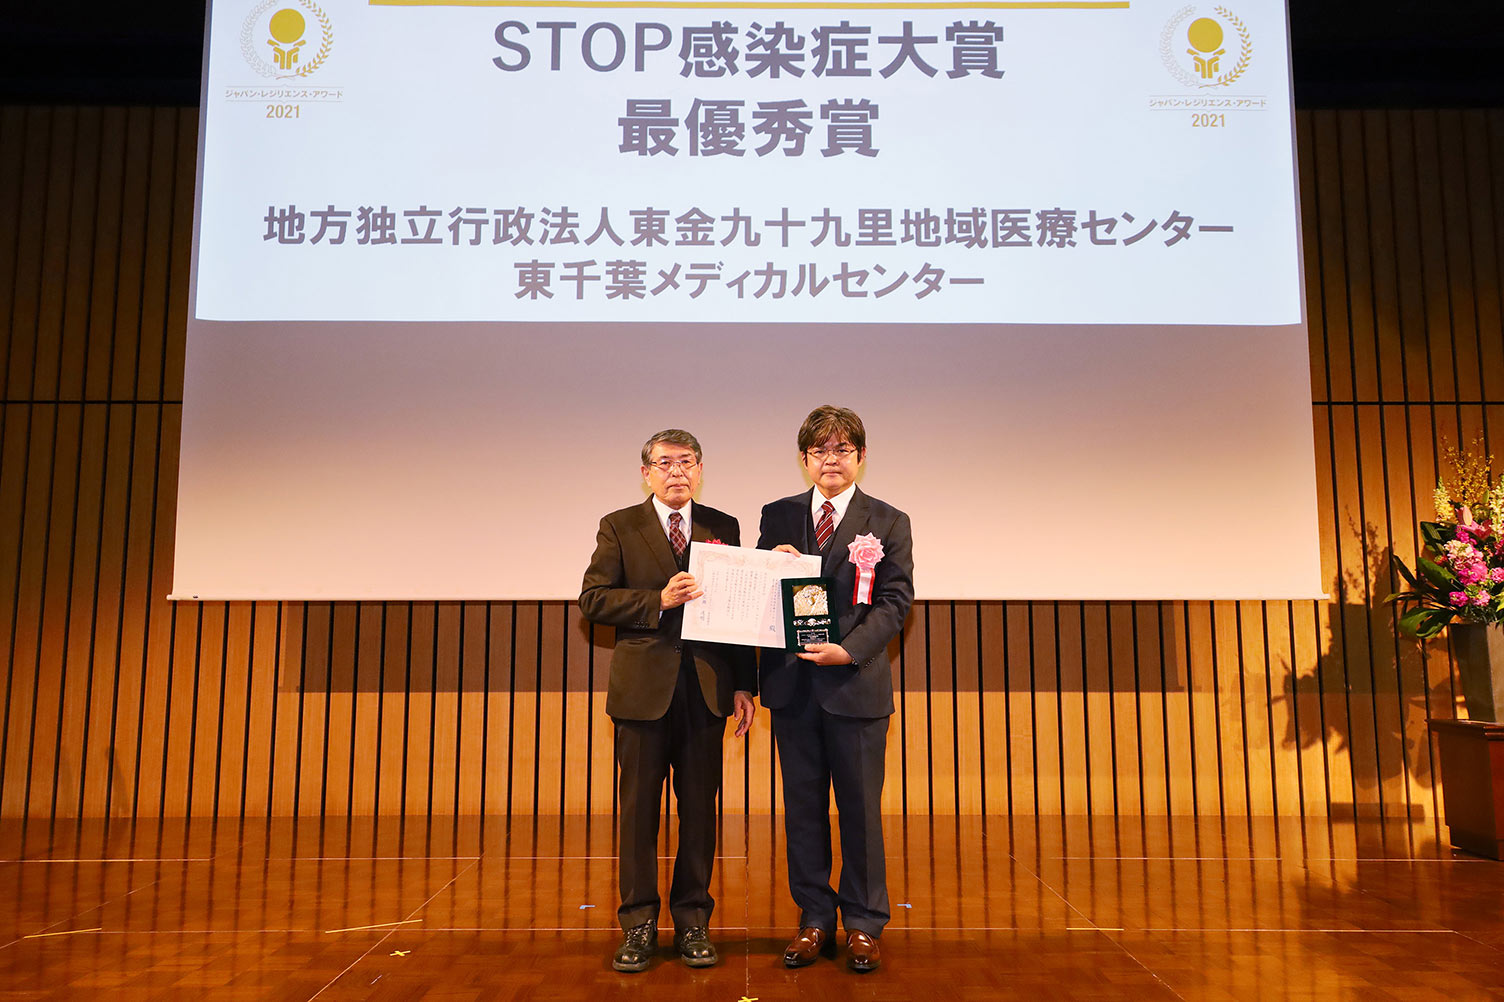 STOP感染症大賞最優秀賞を受賞しました